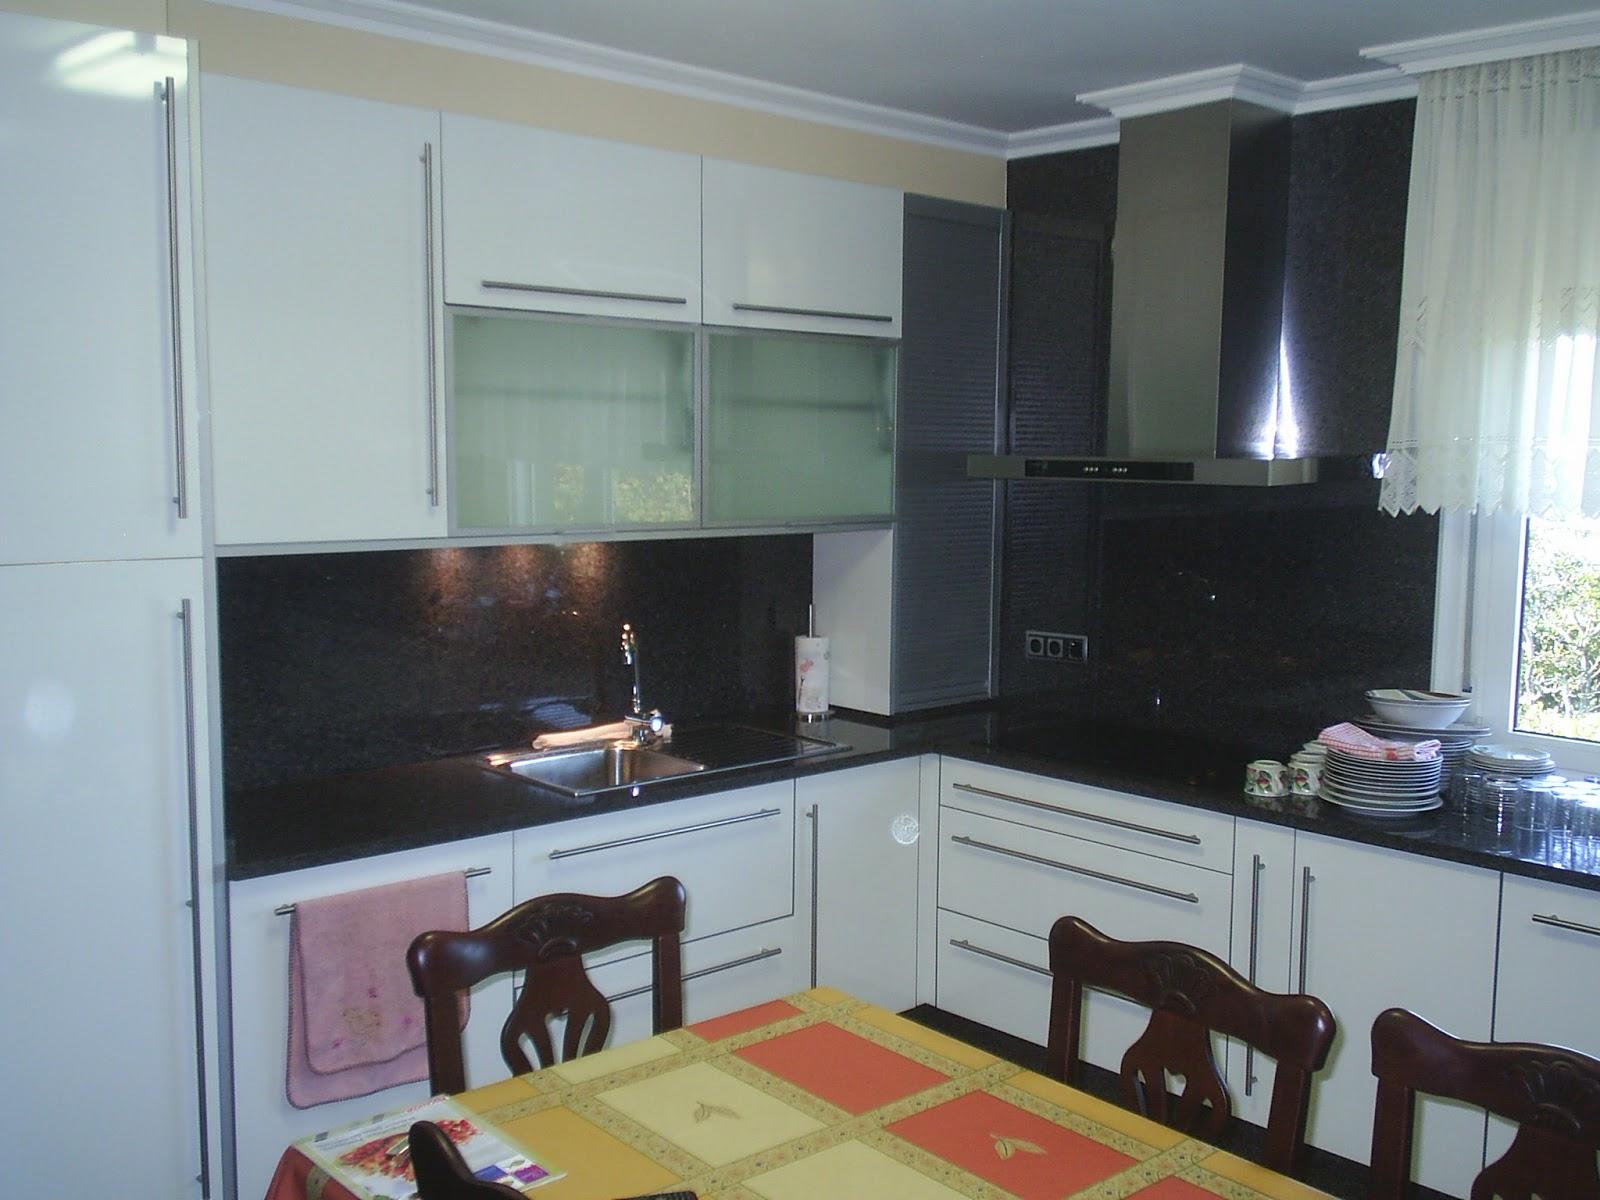 Cocina Con Encimera Negra Affordable Barras De Cocina